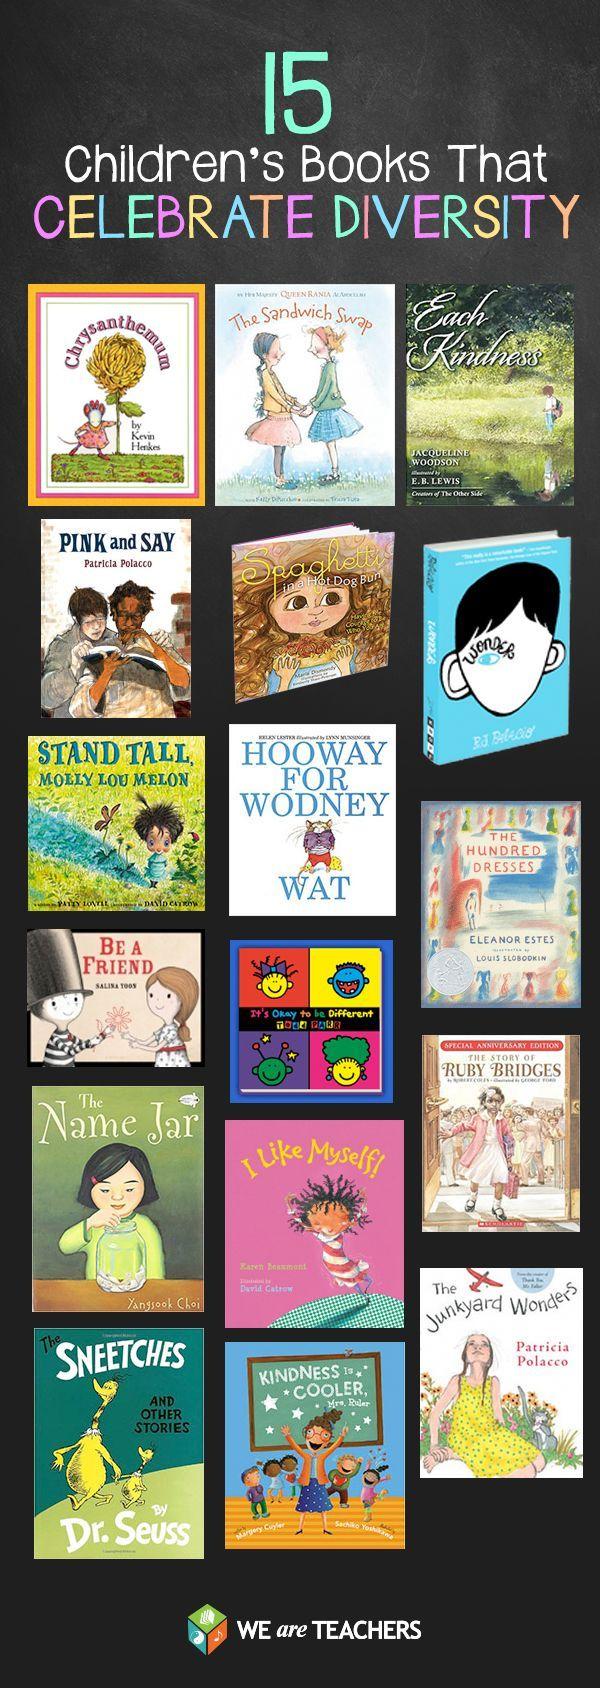 15 Great Children's Books That Celebrate Diversity